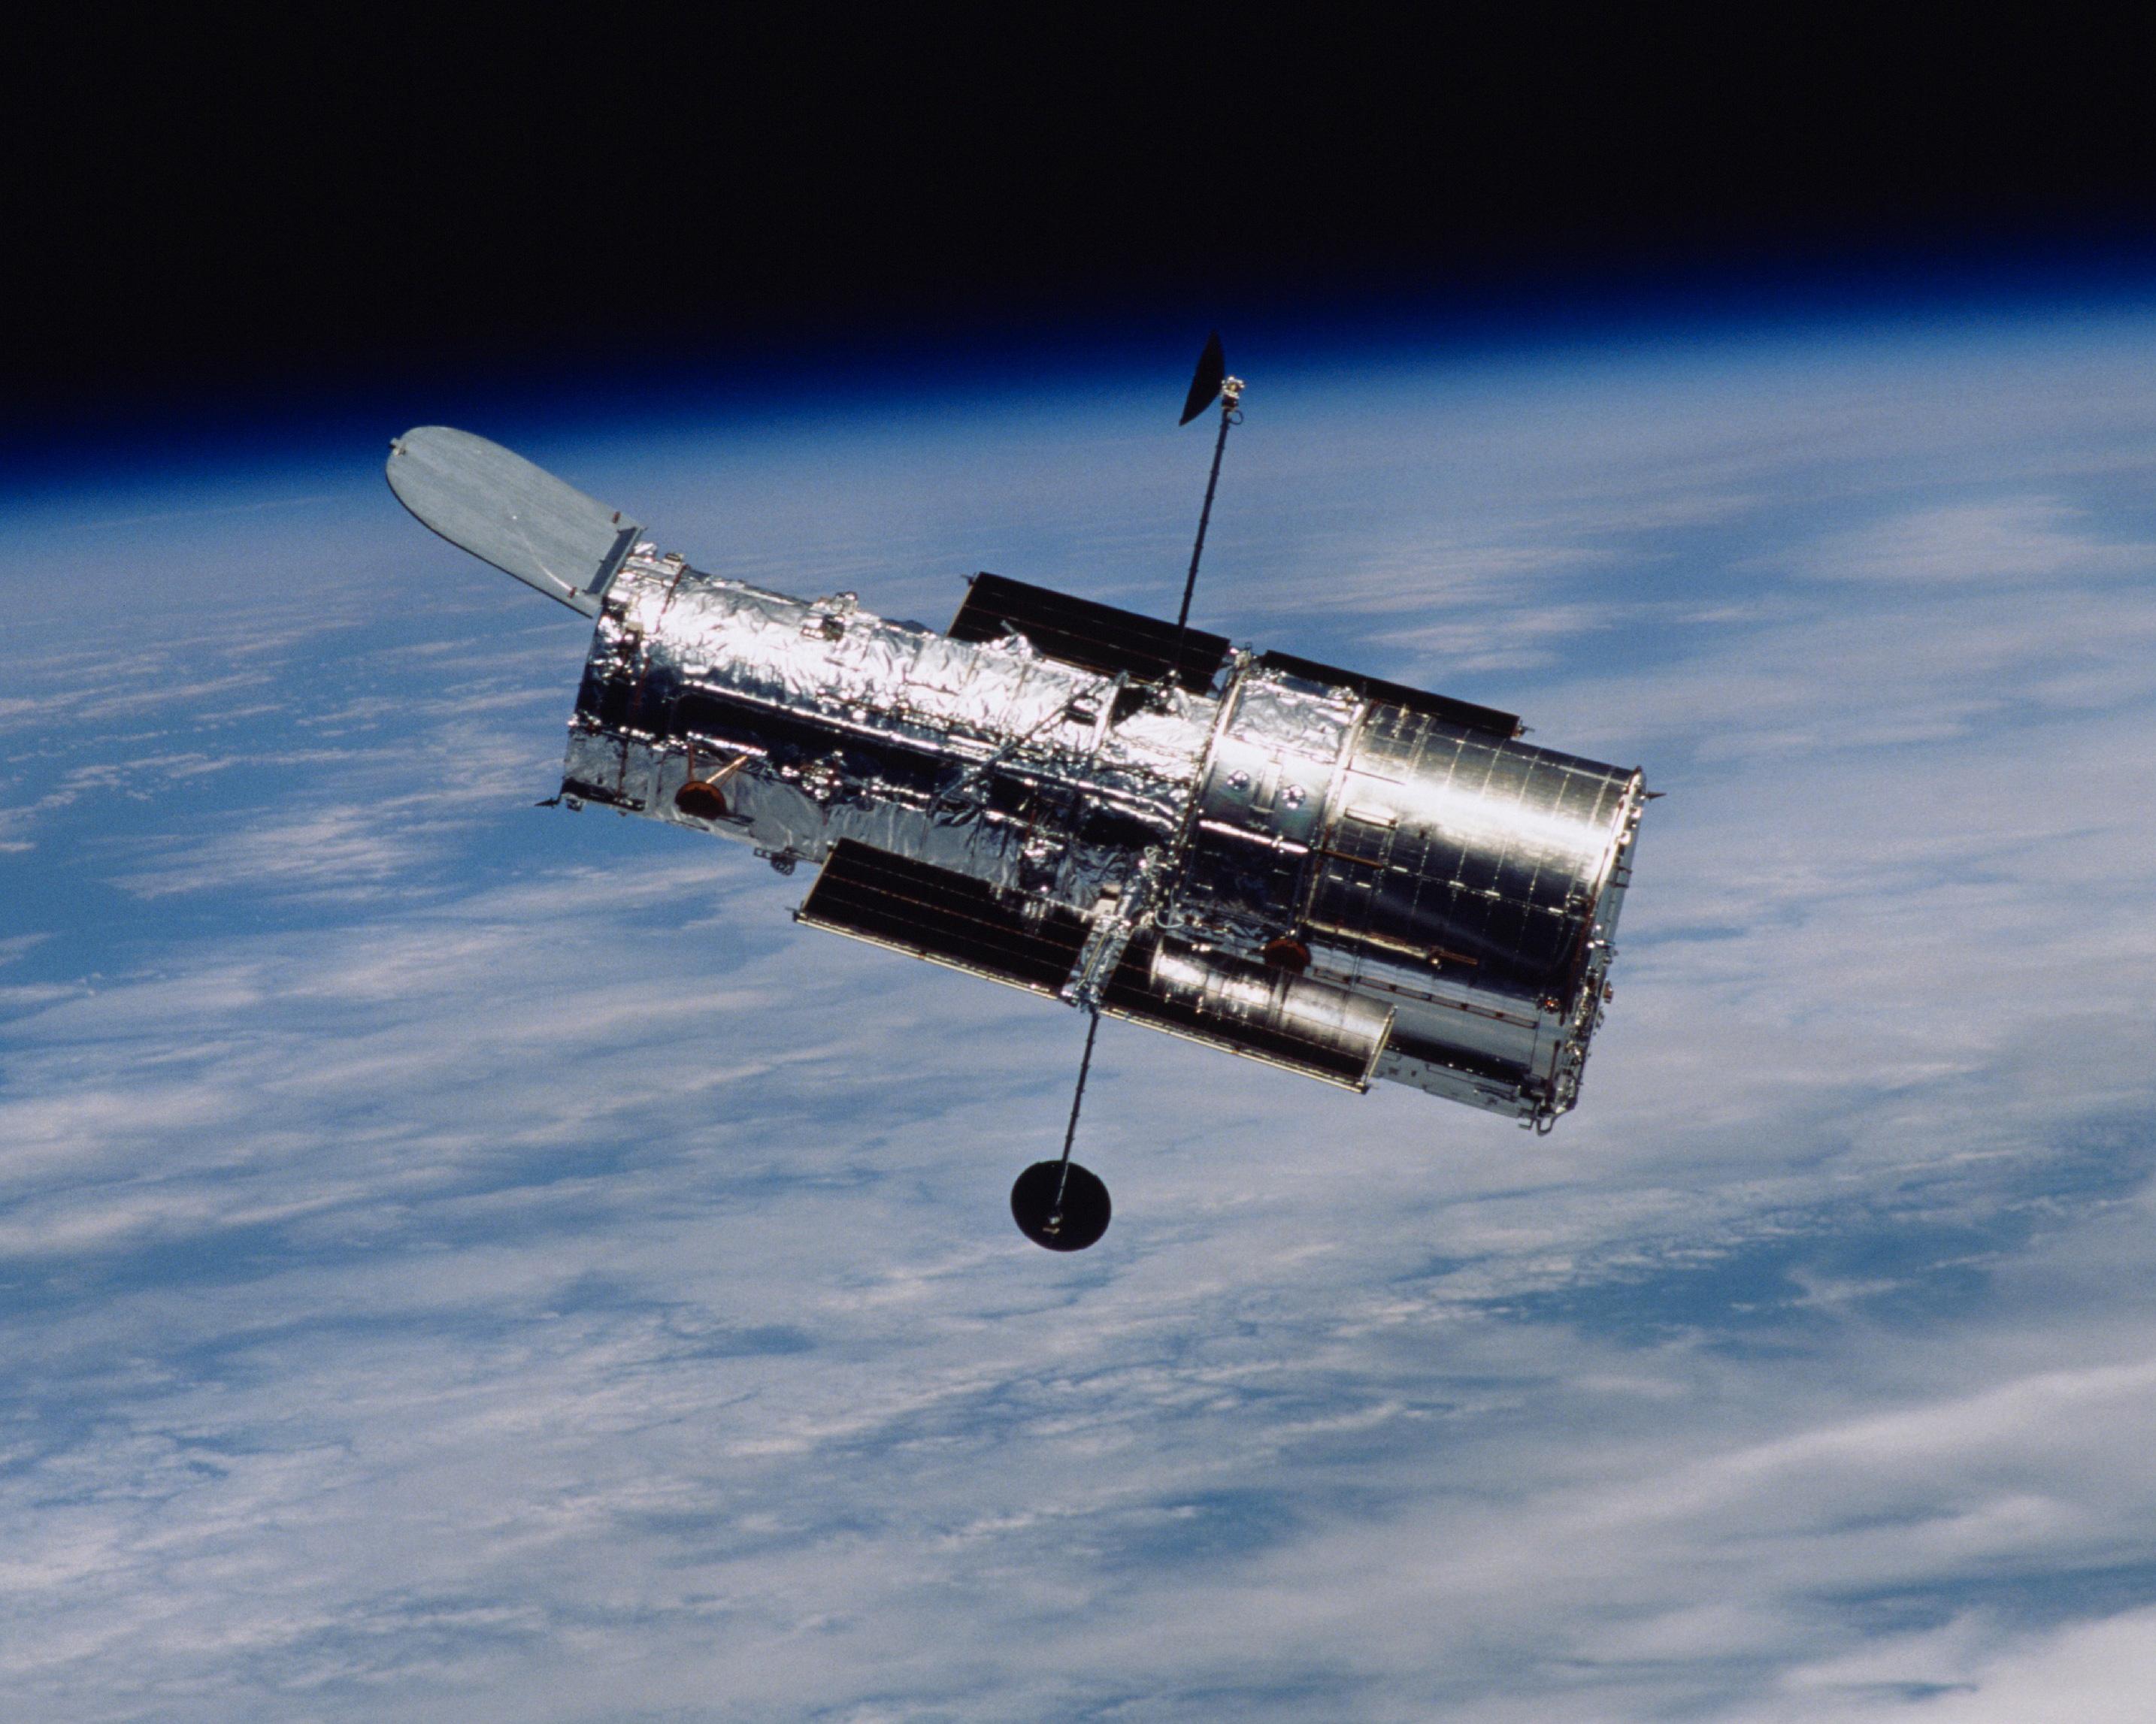 Image Archive: Spacecraft | ESA/Hubble